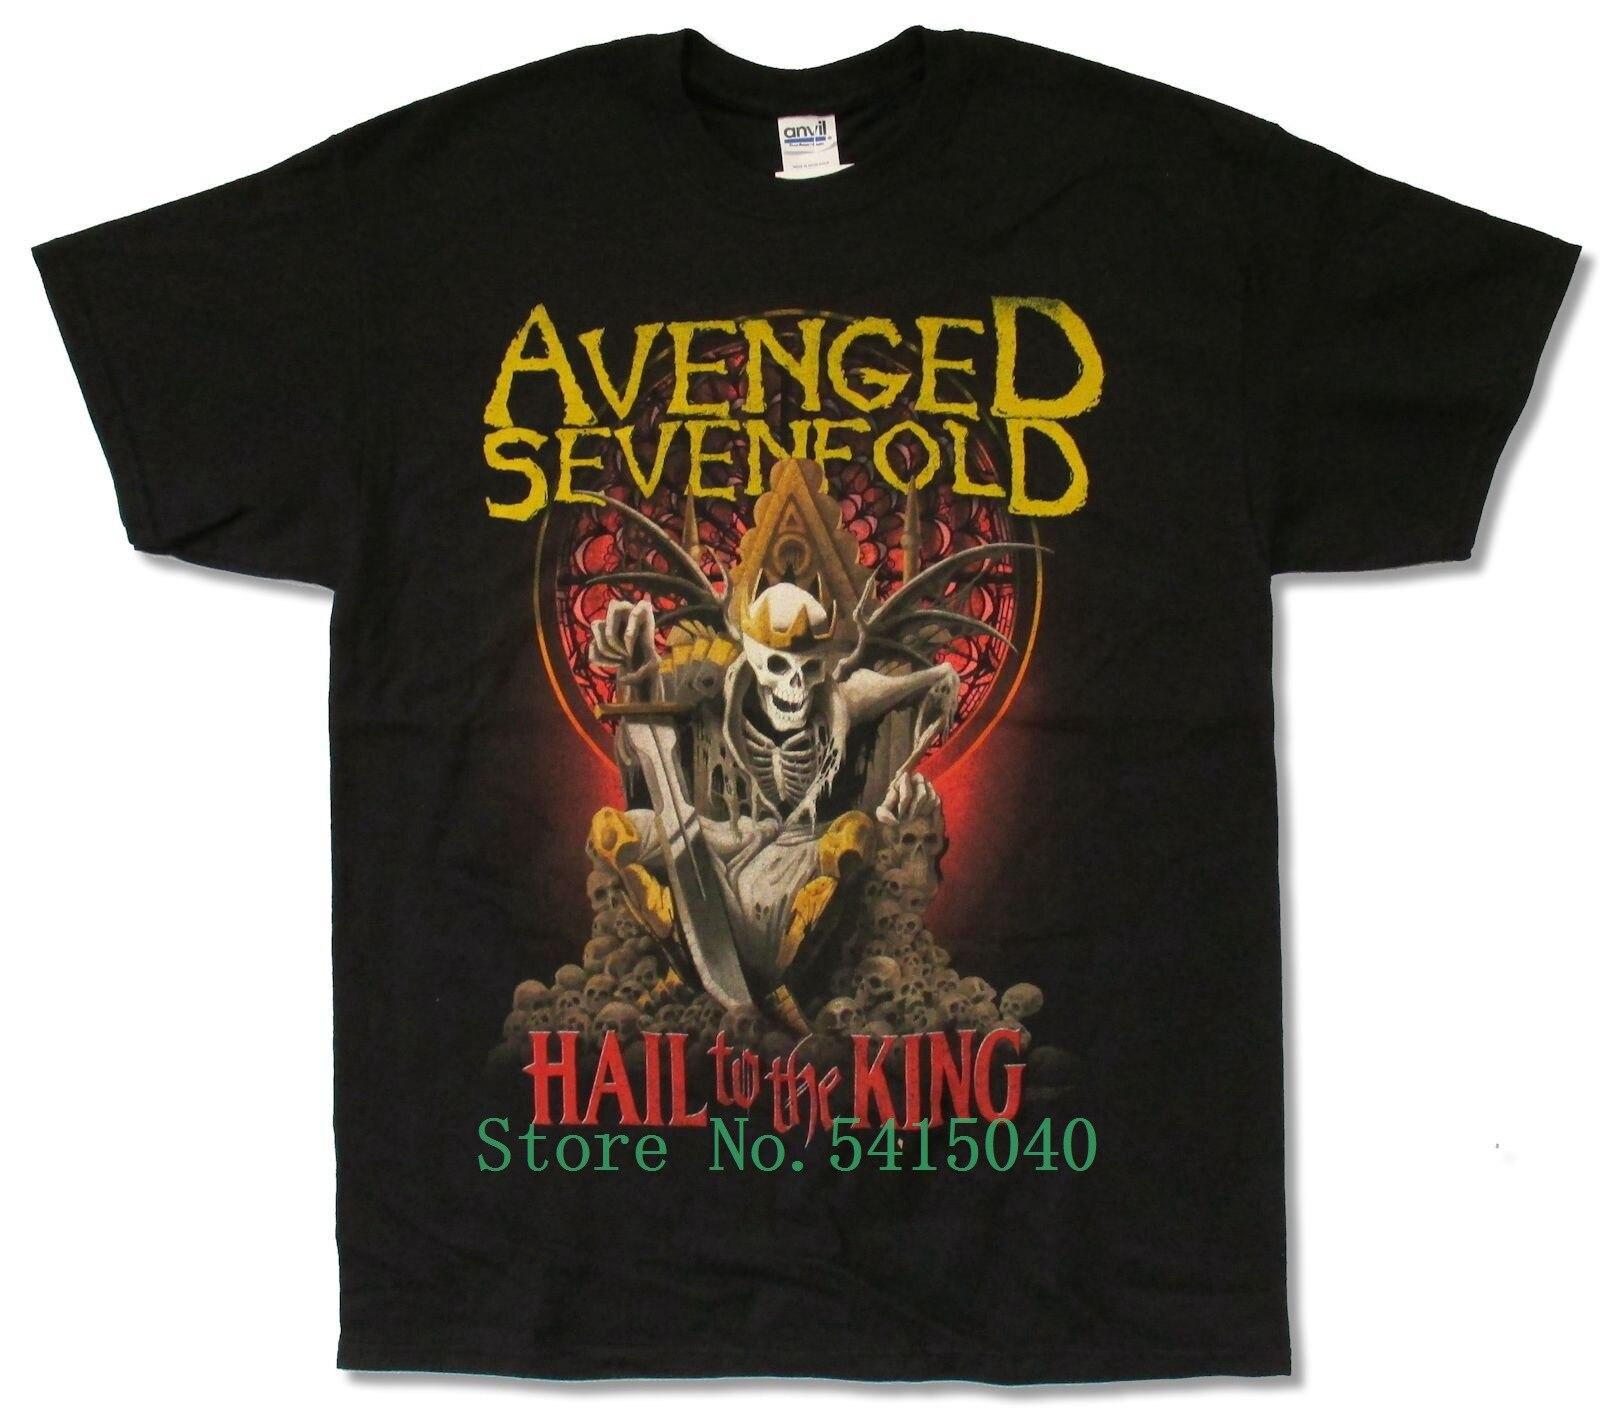 Avenged Sevenfold New Day Rises Tour 2014 Black Shirt New Official A7x Hail King Print T Shirt Men Brand Letter Clothing